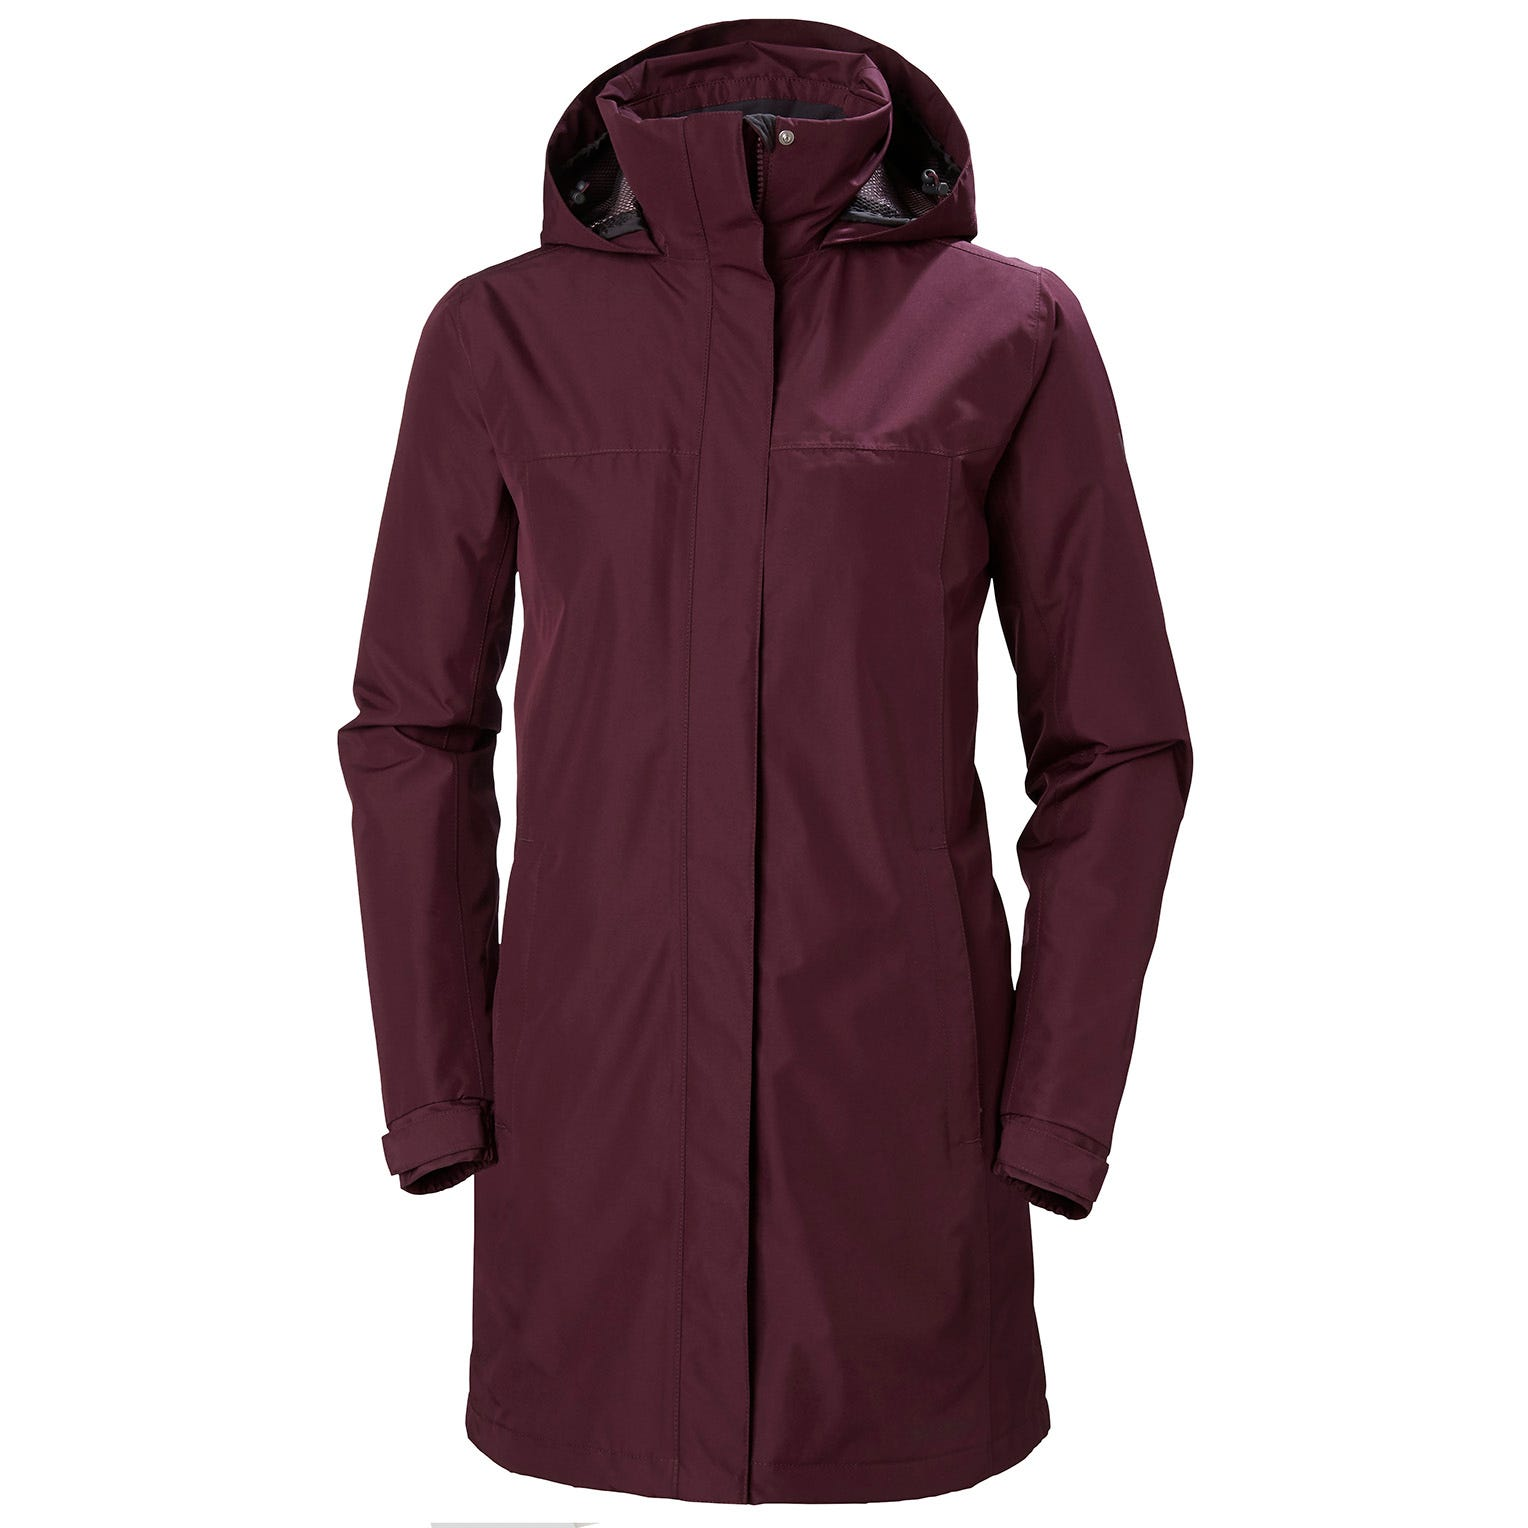 Helly Hansen Womens Aden Insulated Coat Parka Purple M